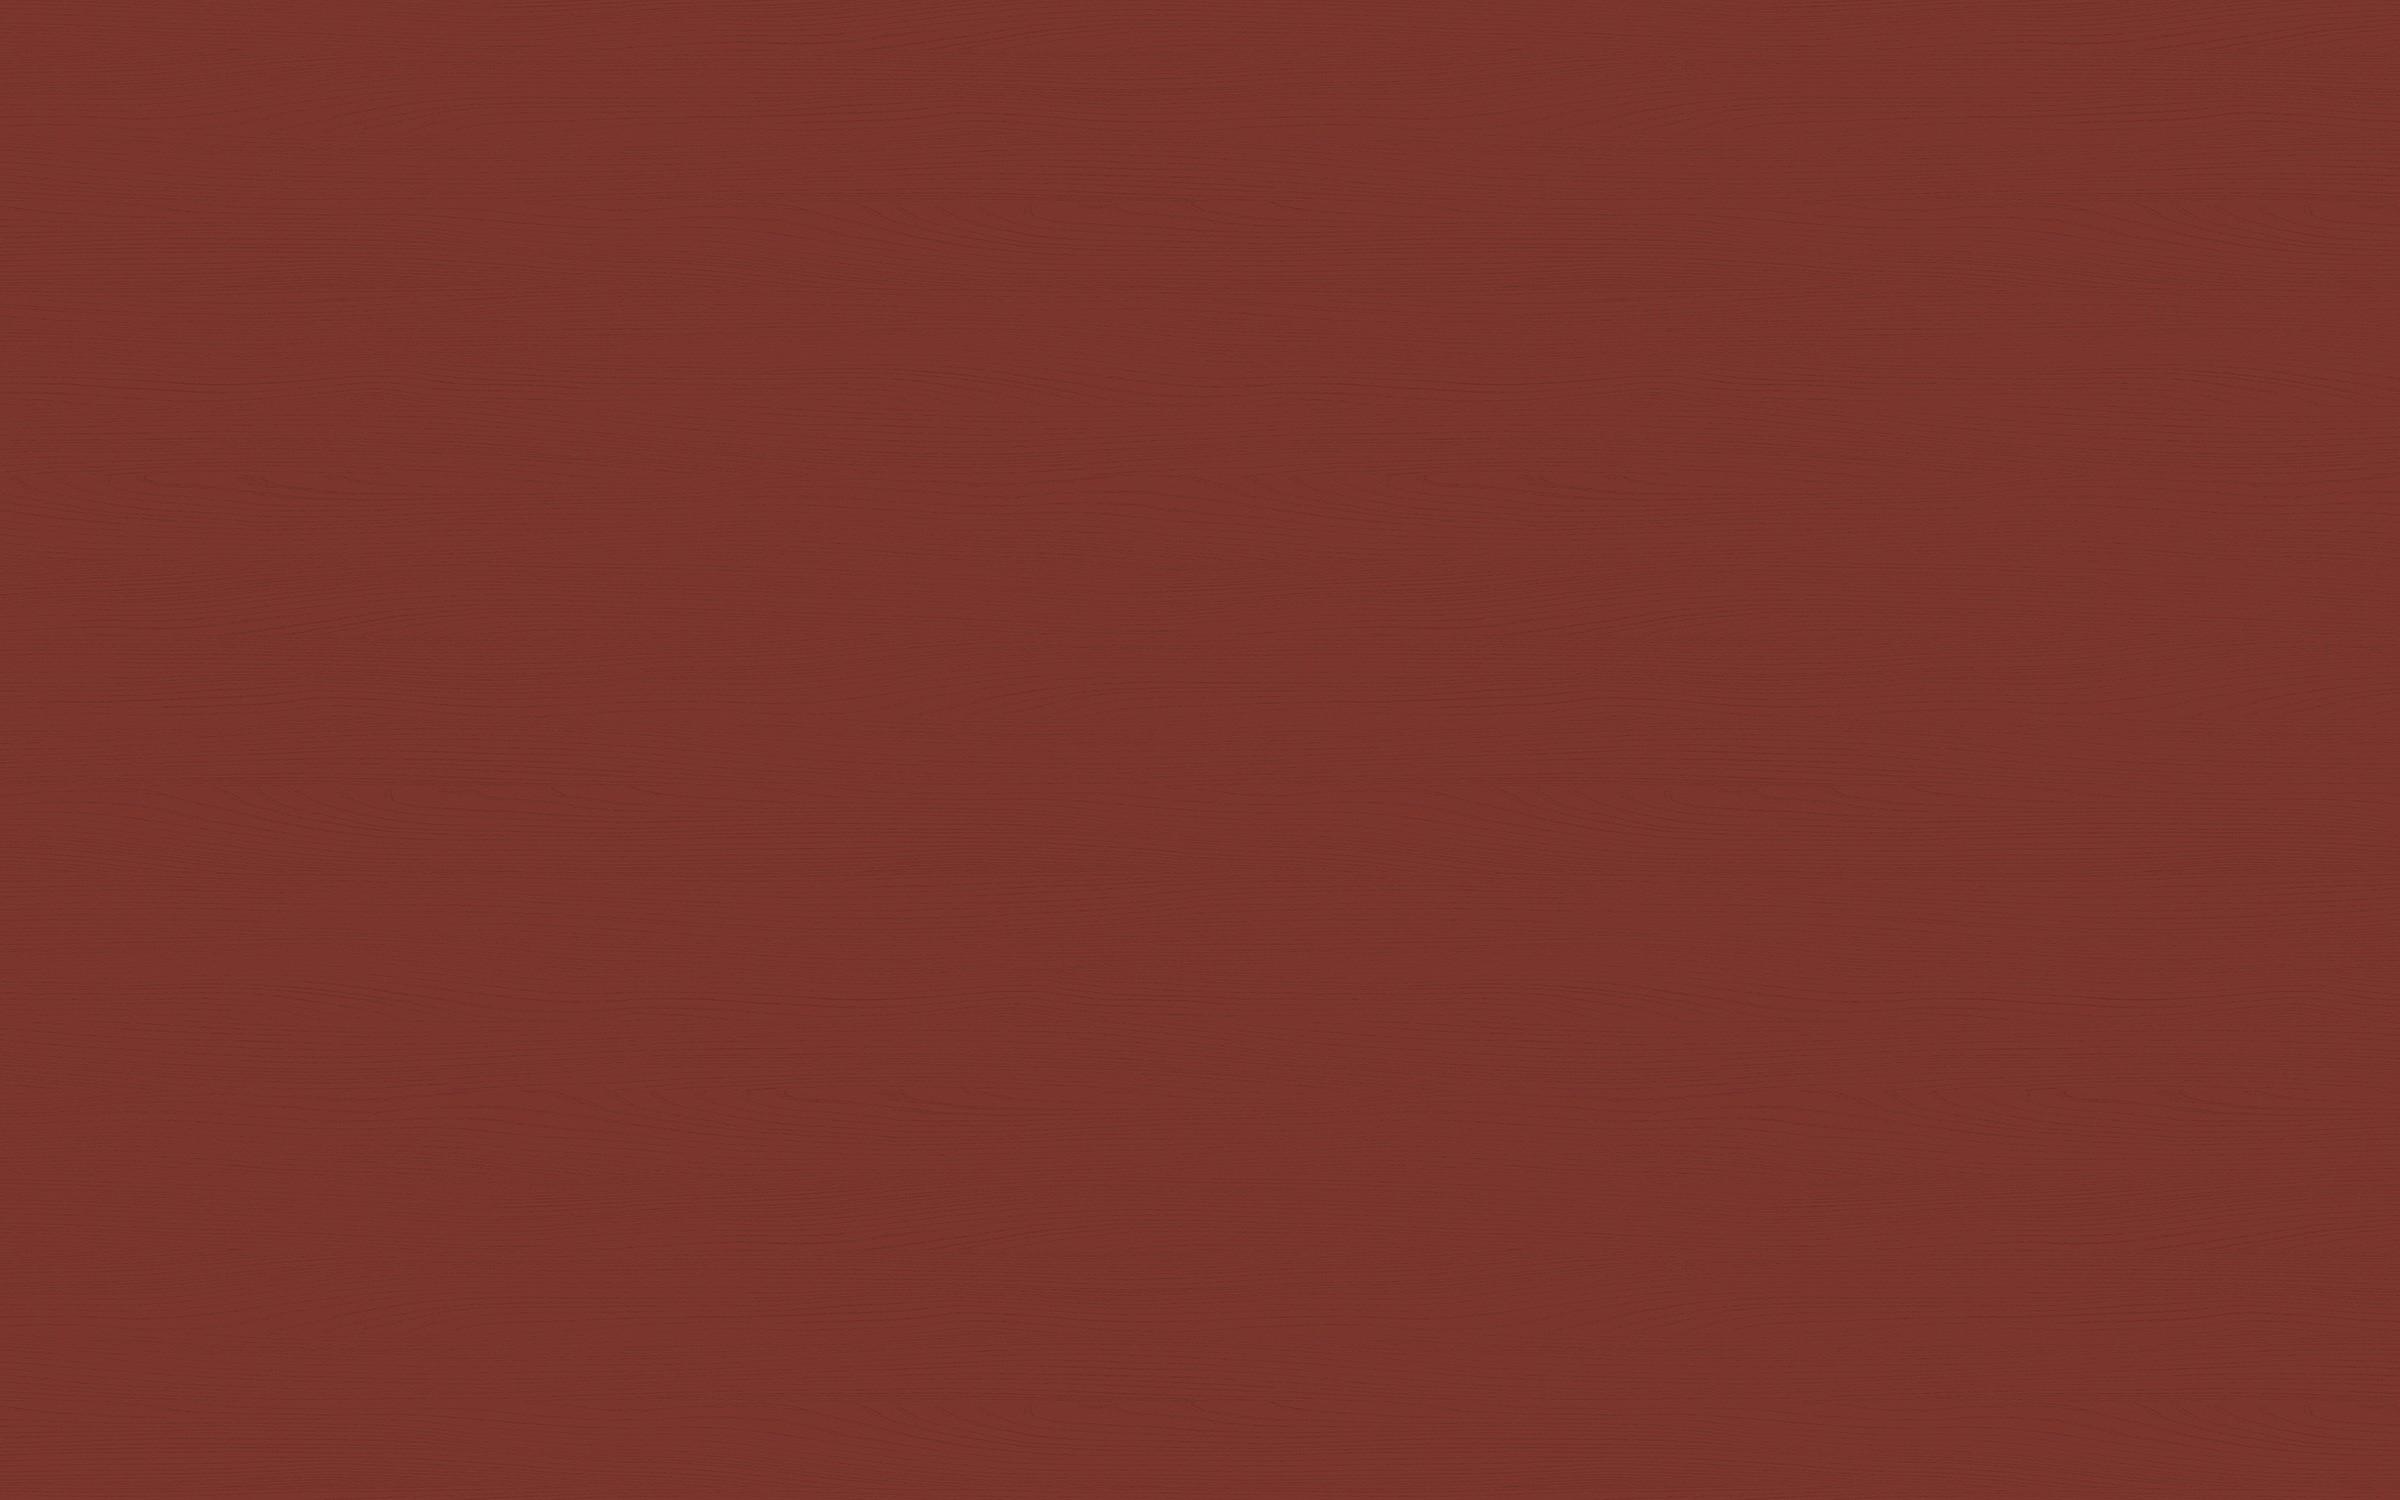 7979 Red Barn - Wilsonart